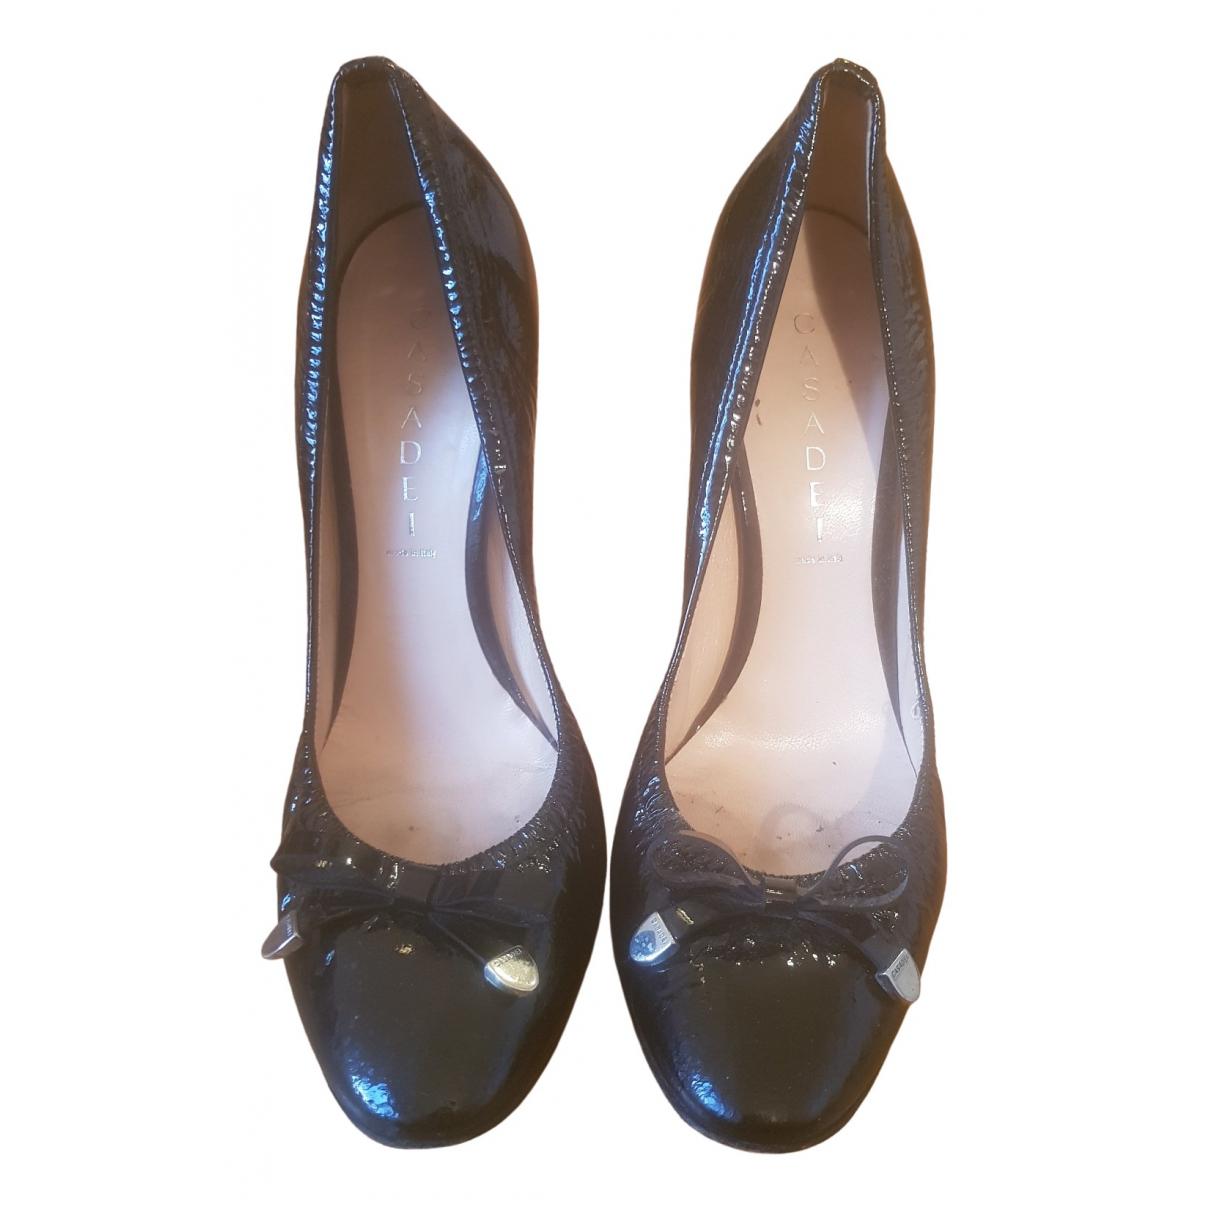 Casadei \N Black Patent leather Heels for Women 38.5 EU